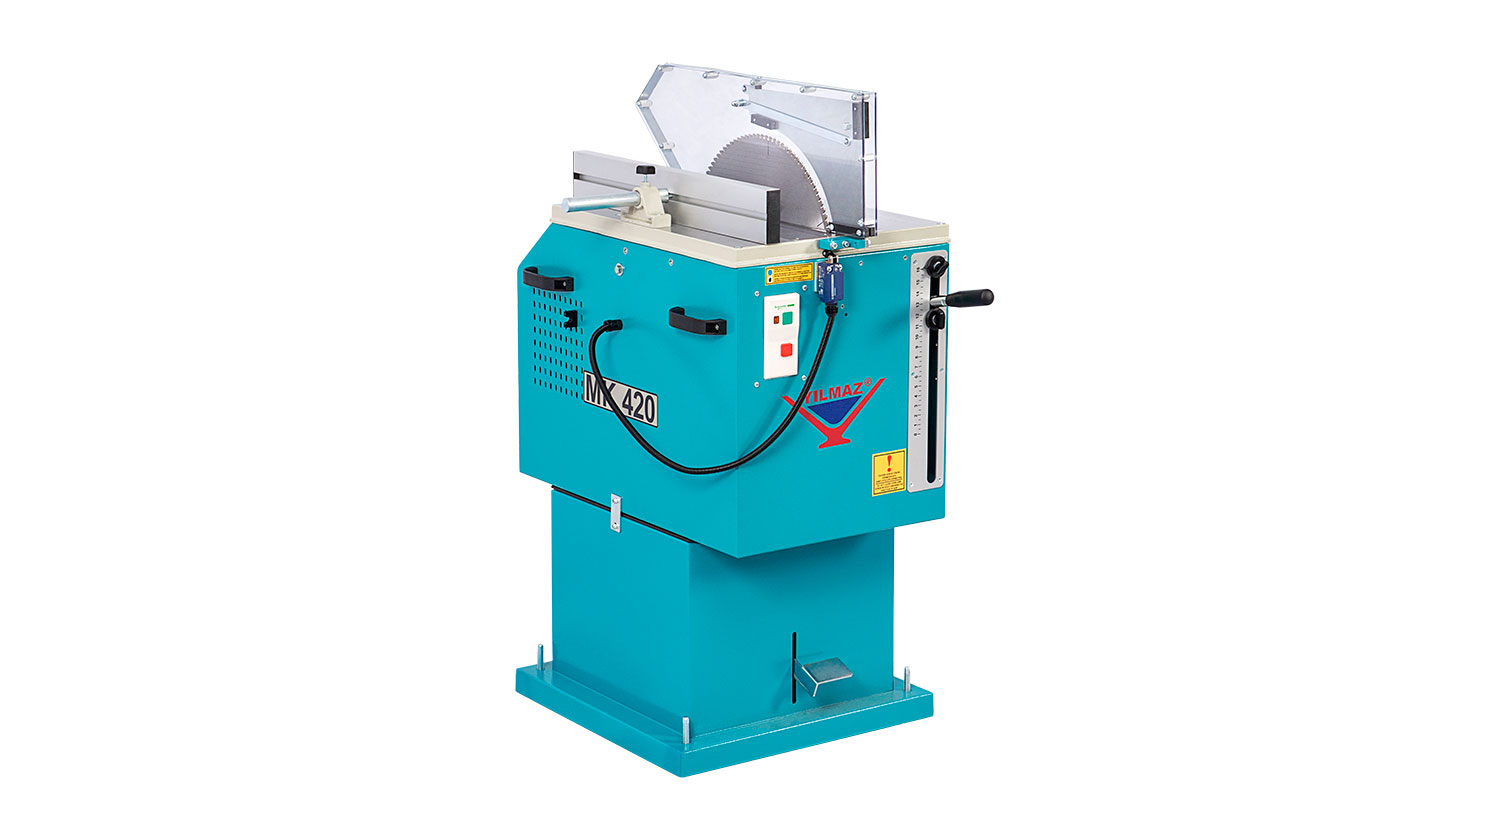 INT aluminum manual up cut saw Yilmaz MK 420 a